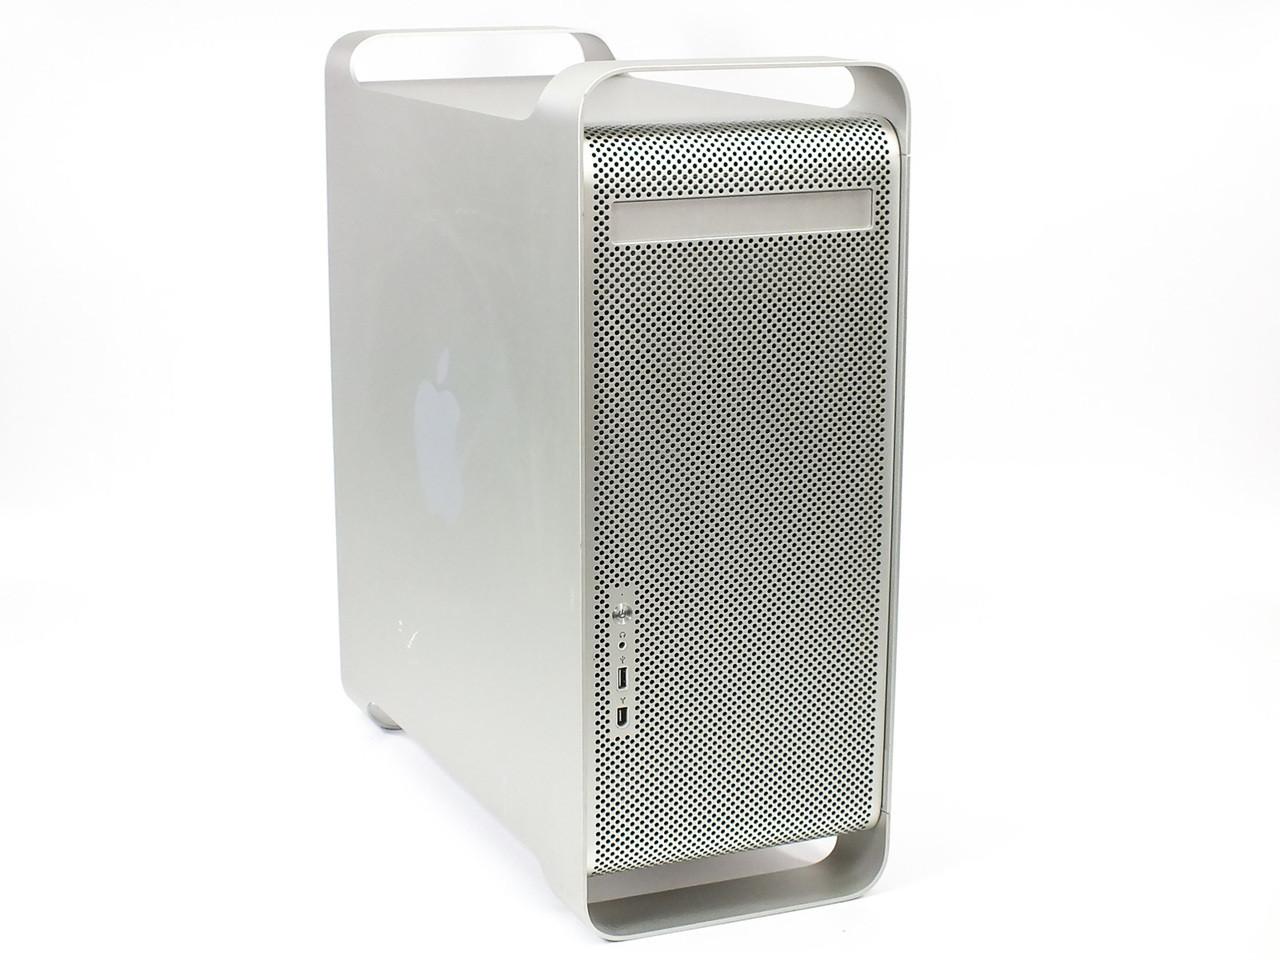 Power Mac G5 – Wikipedia